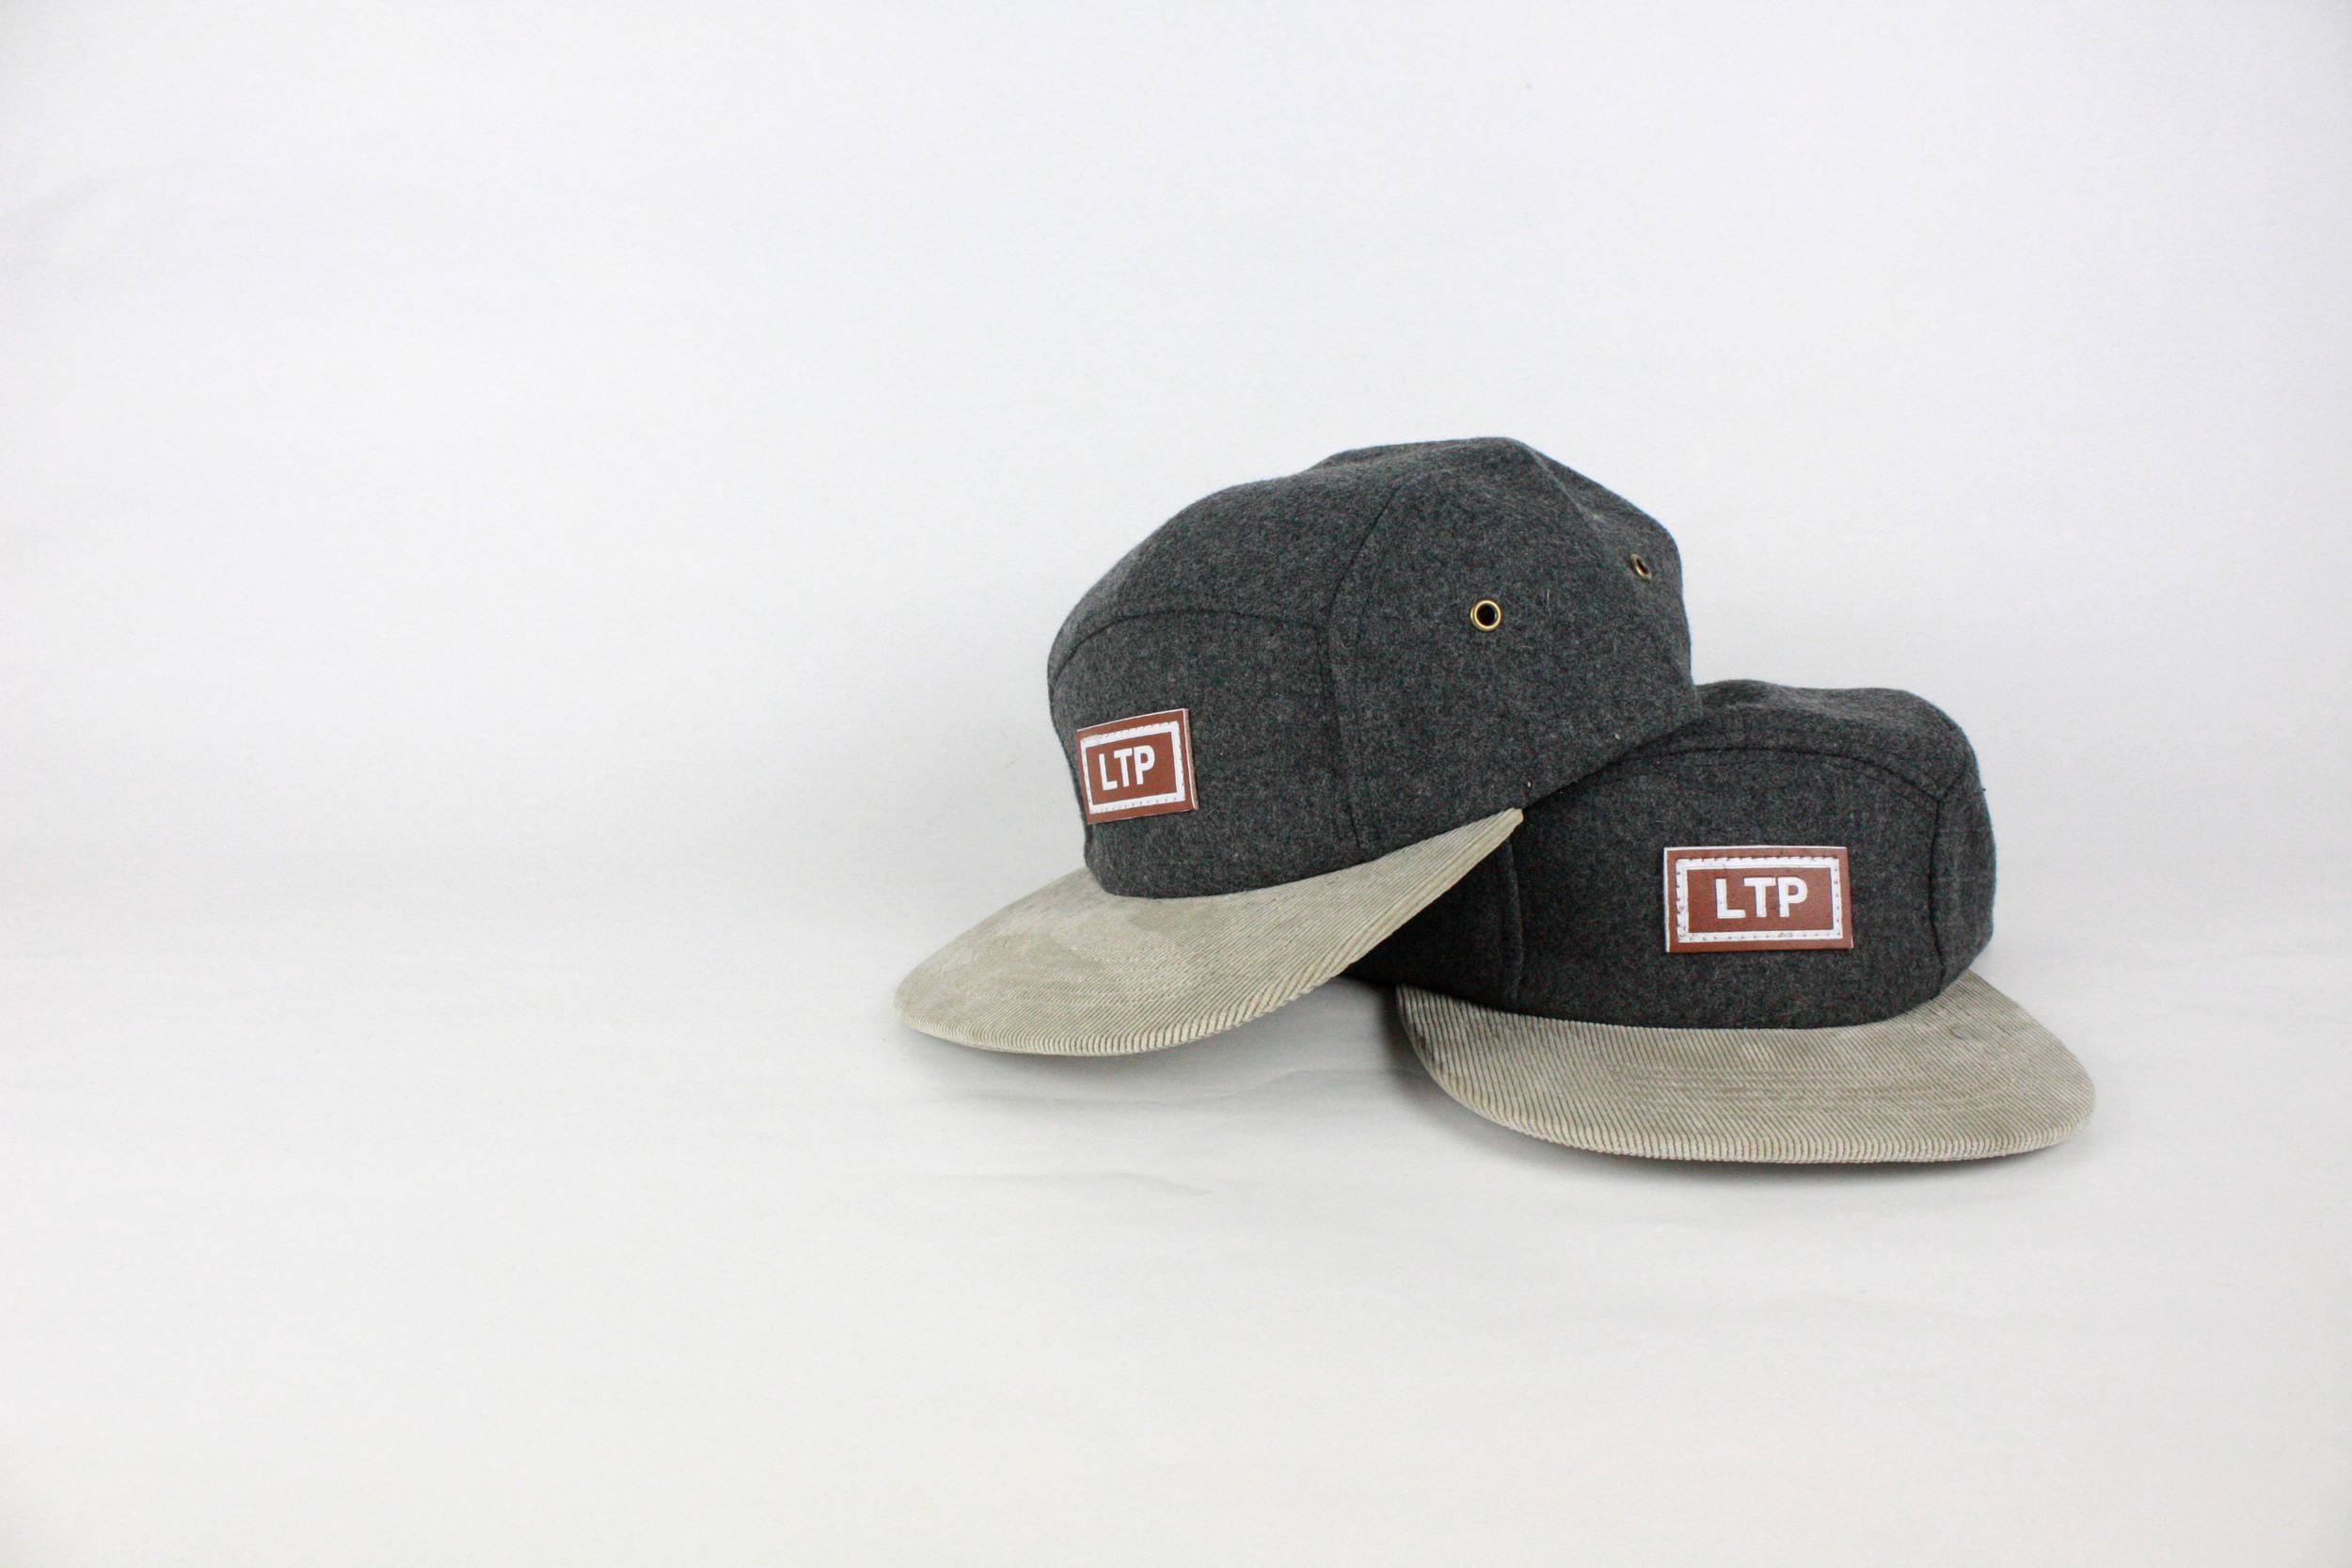 LTP Hat 6.jpg